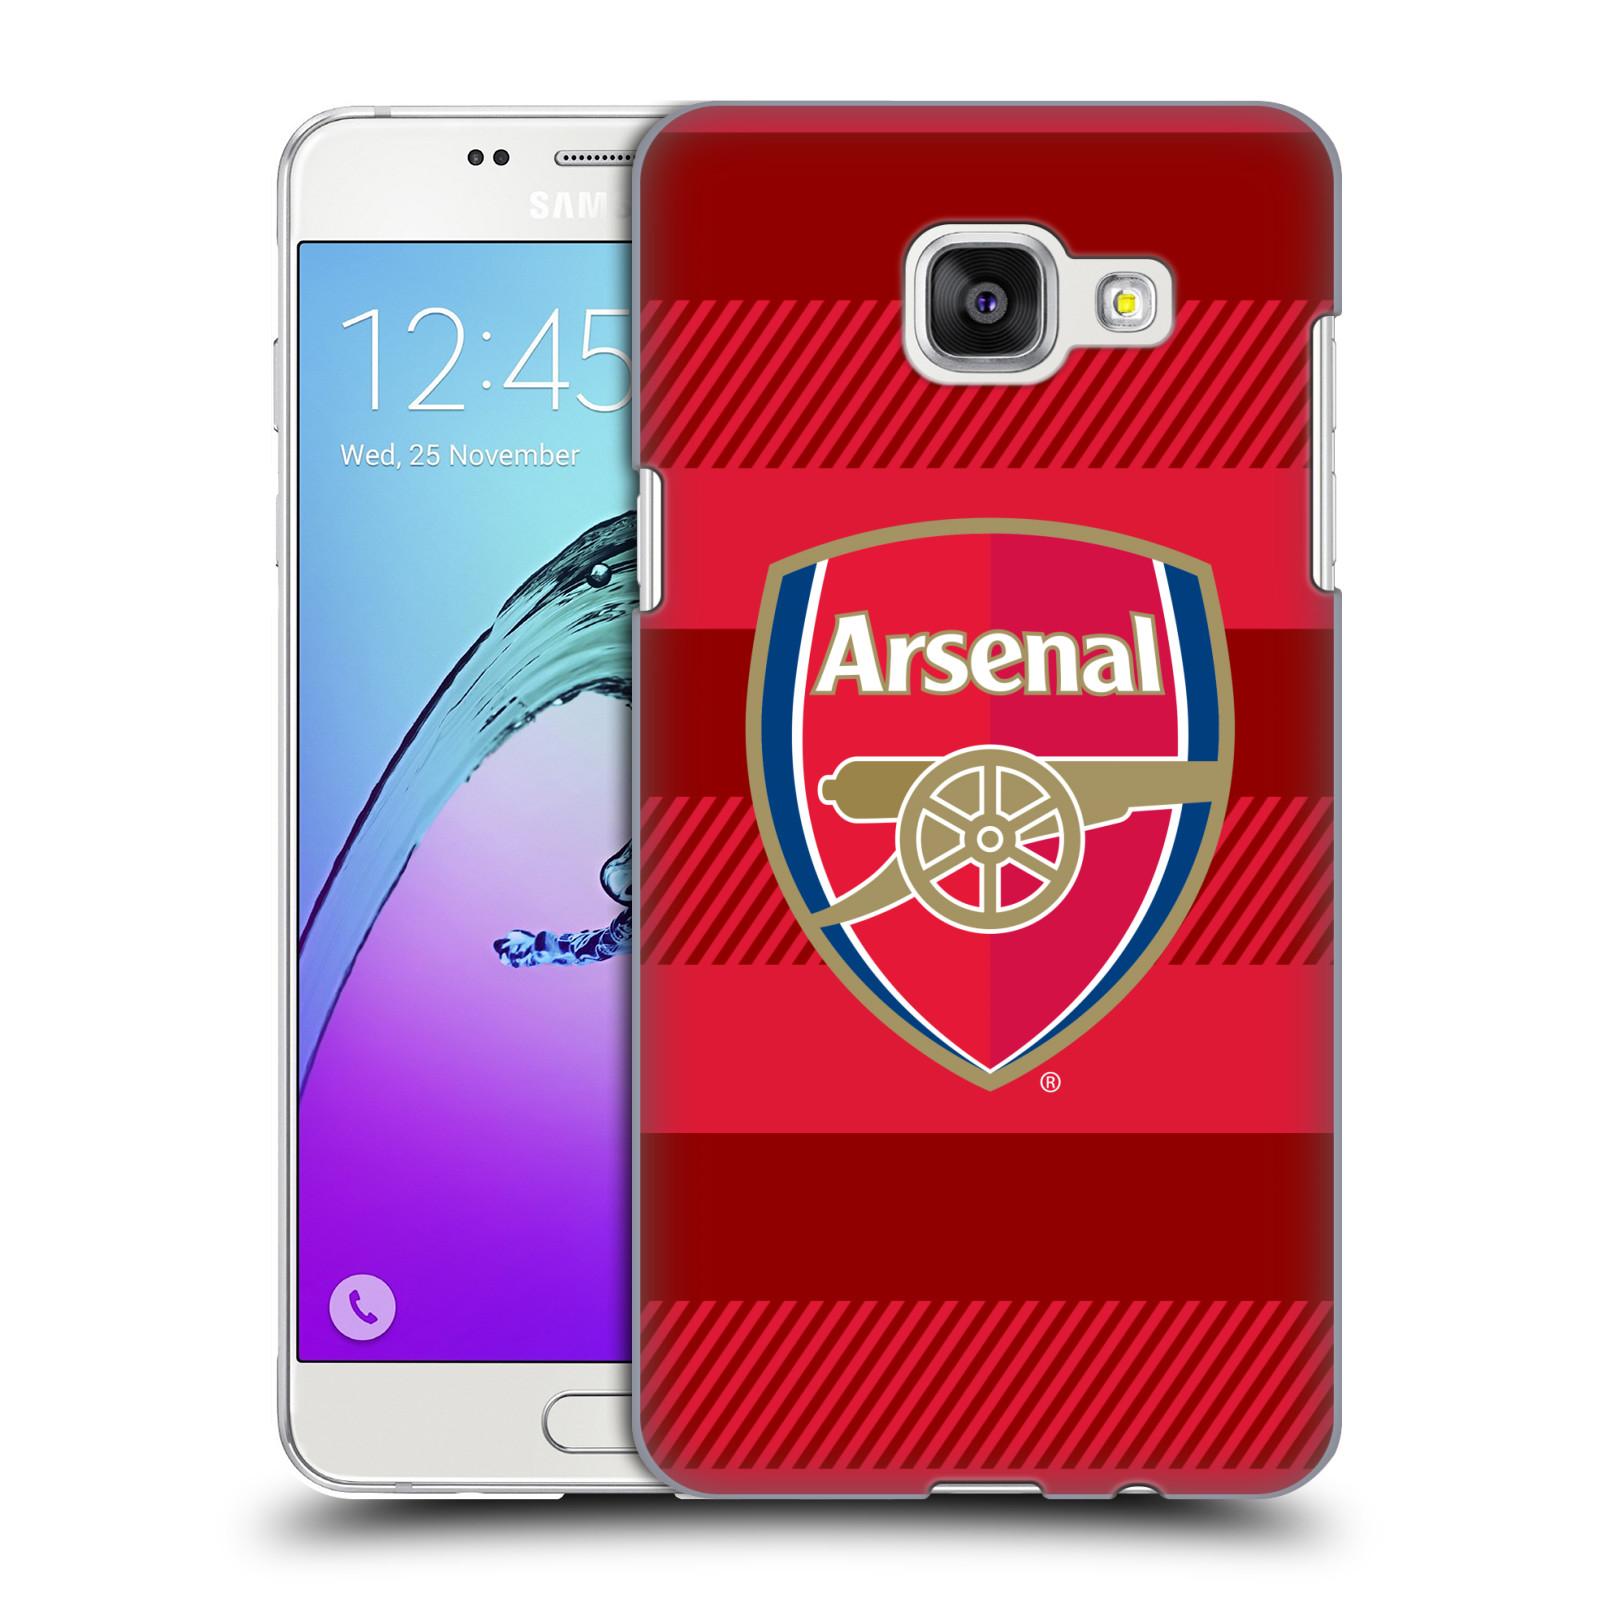 Plastové pouzdro na mobil Samsung Galaxy A5 (2016) - Head Case - Arsenal FC - Logo s pruhy